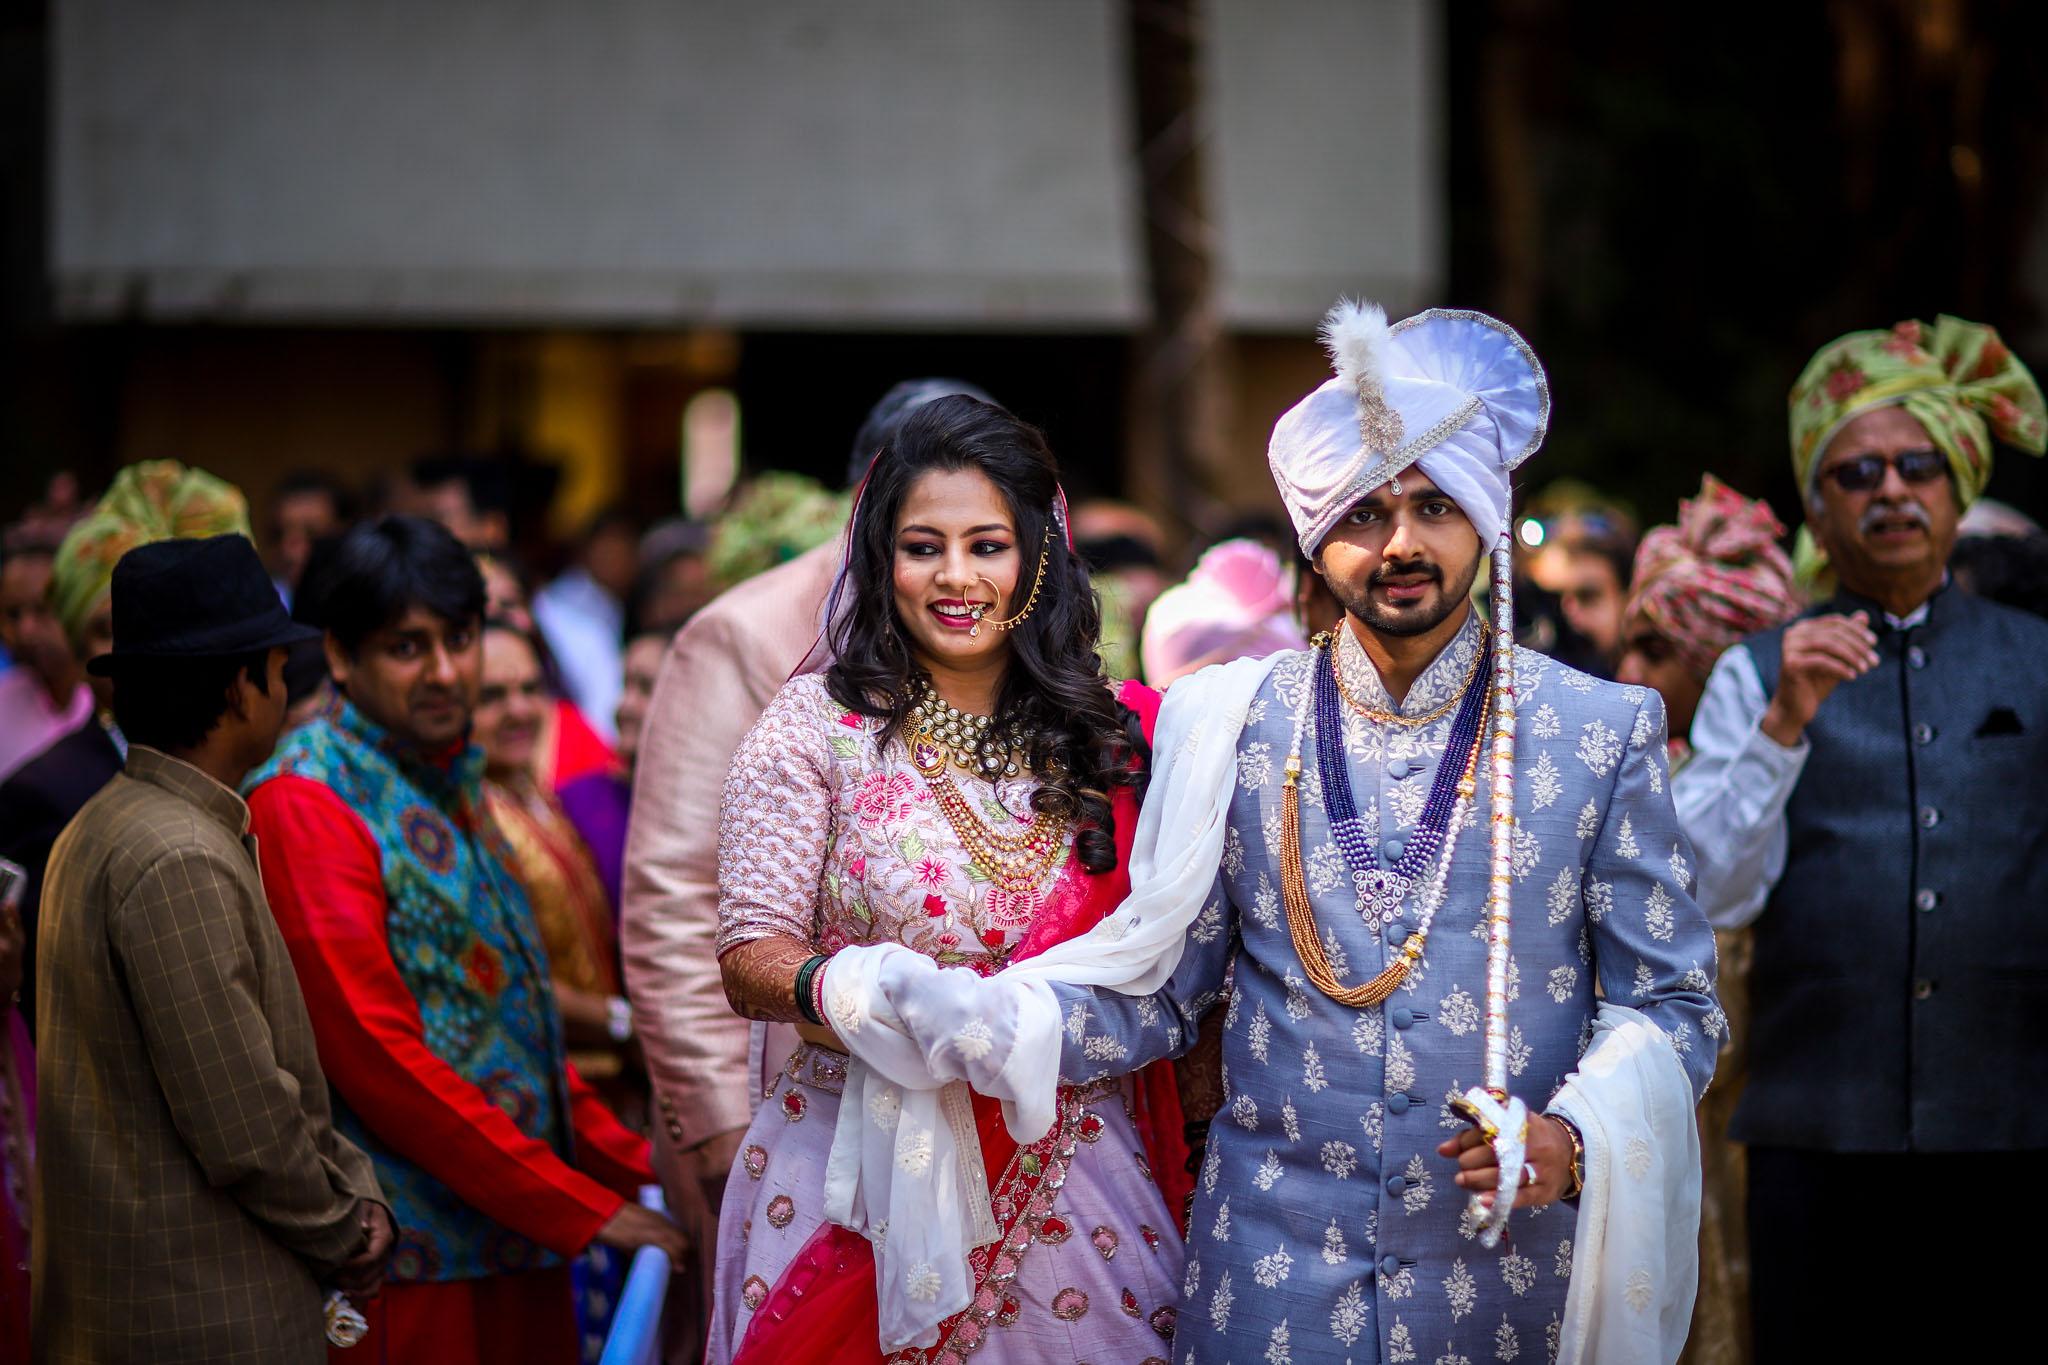 Mukti x Ojas Wedding Akshjay Sansare Photography Best wedding photographer in mumbai India Candid Cinematic Films videos-29.jpg